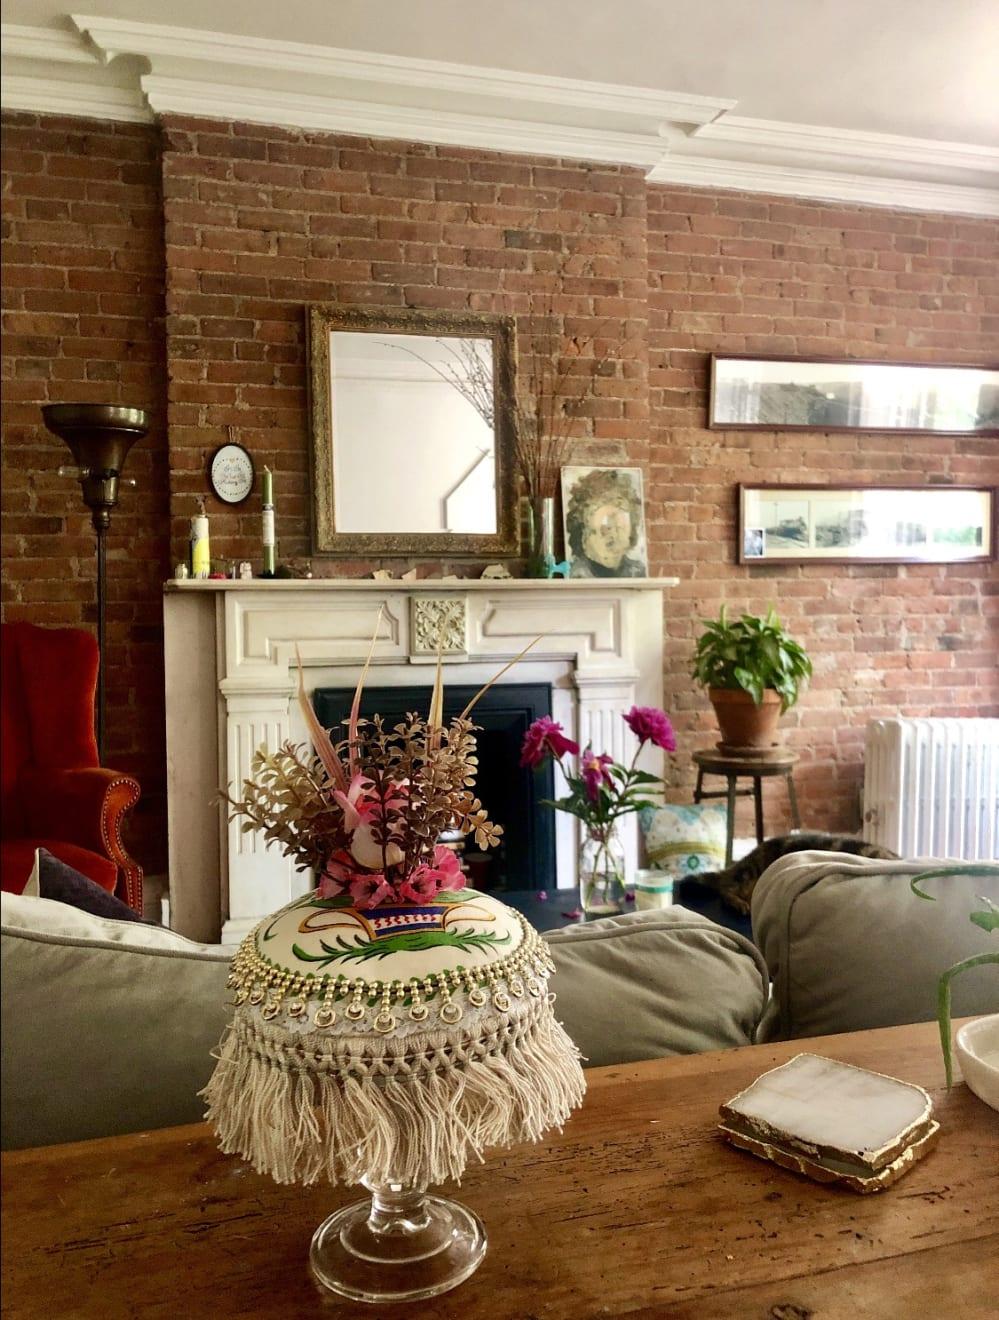 Max Colby Push 4, 2019 Found fabric, trim, fabric flowers, polyester batting, thread